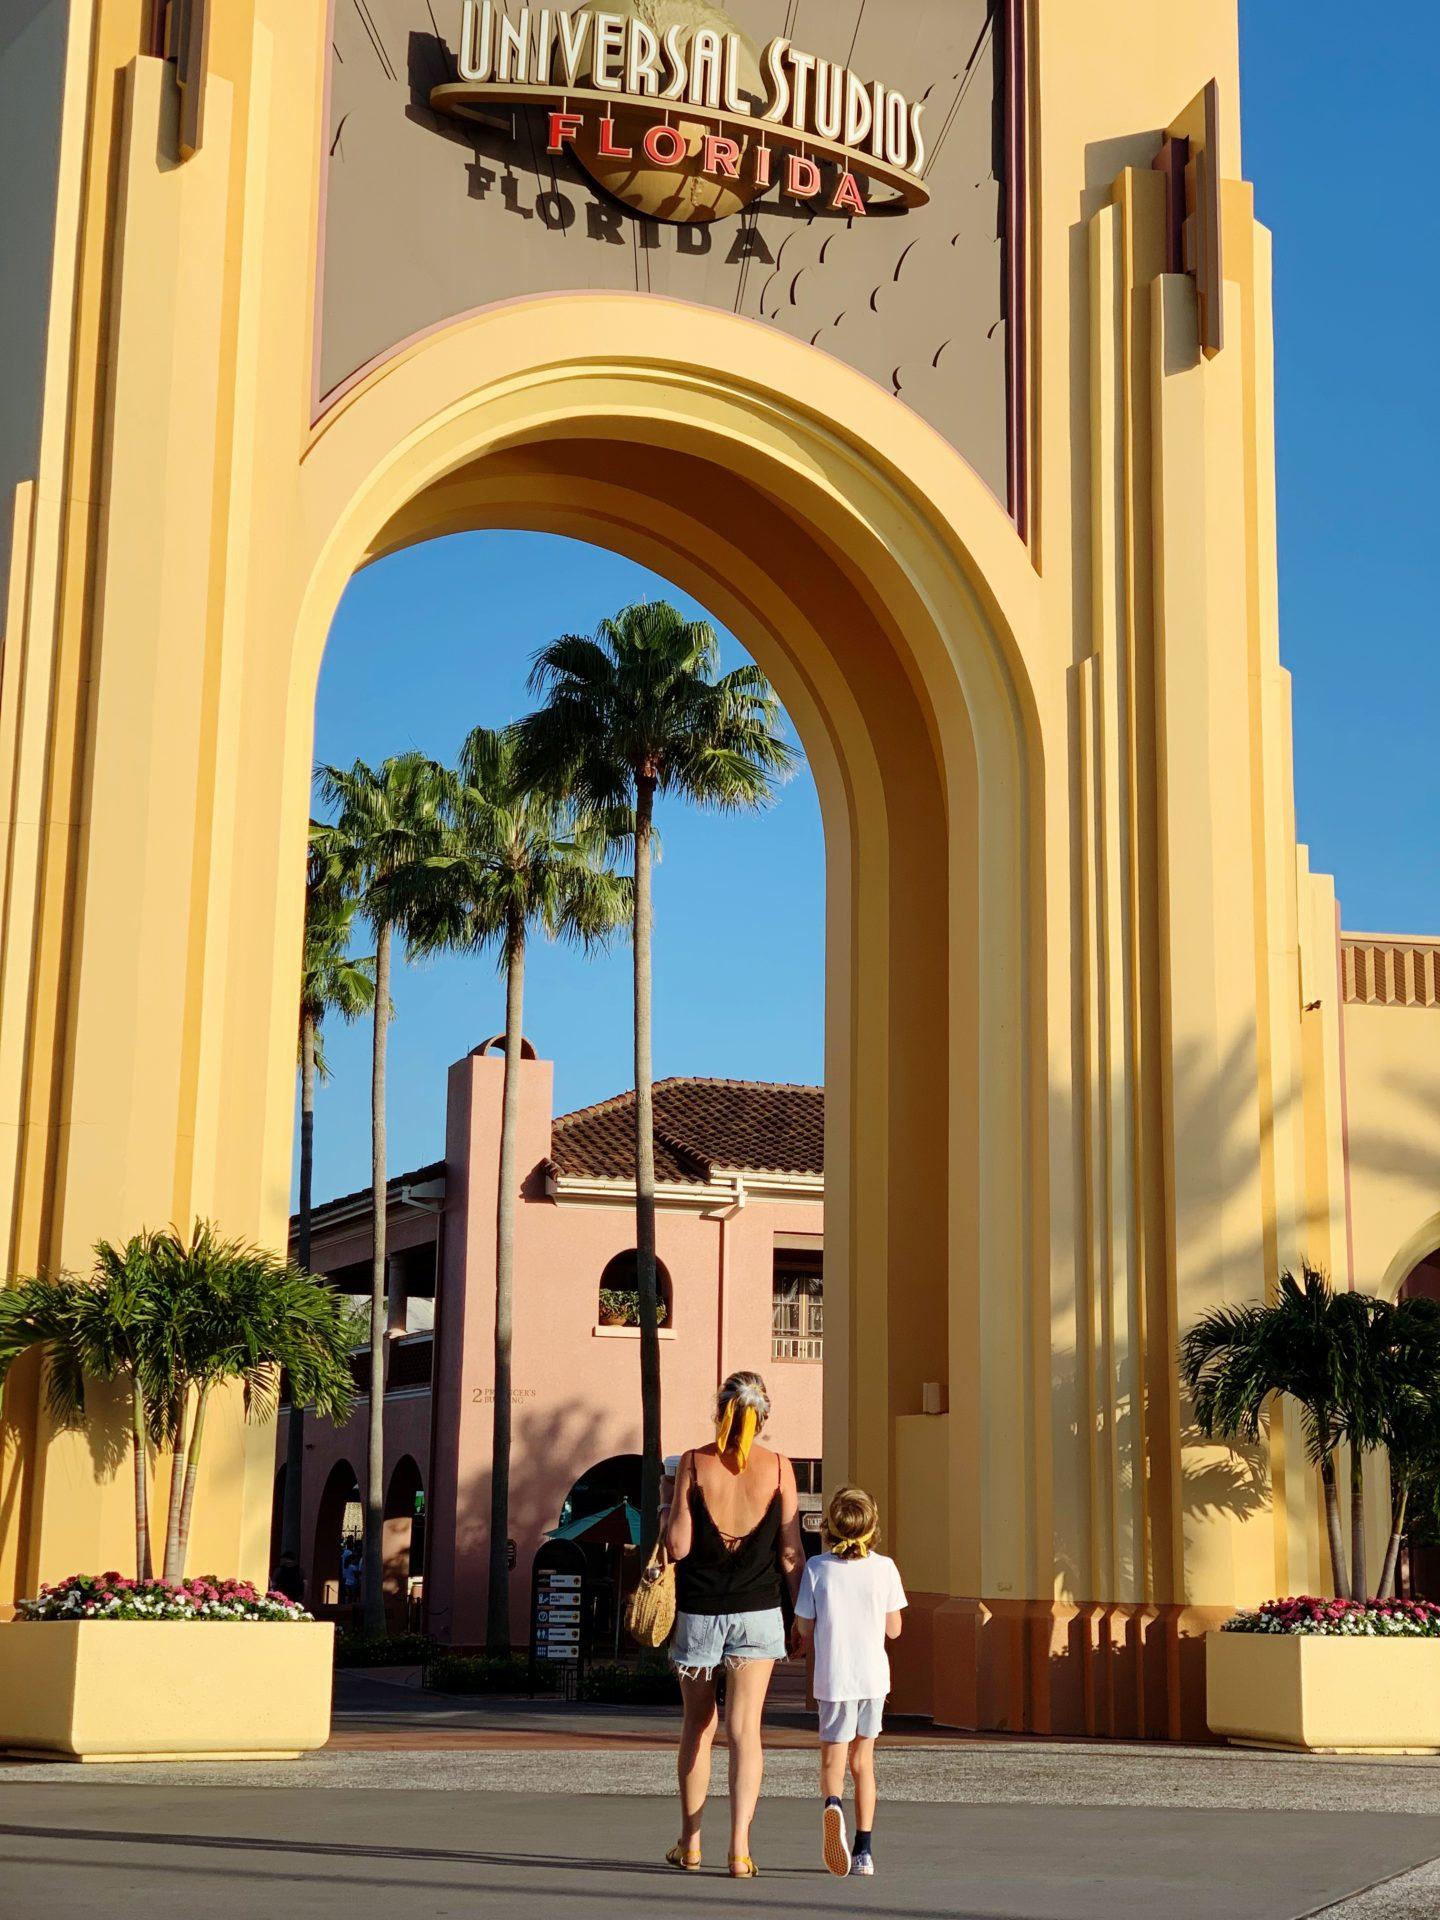 Universal Studios Florida - Park Review